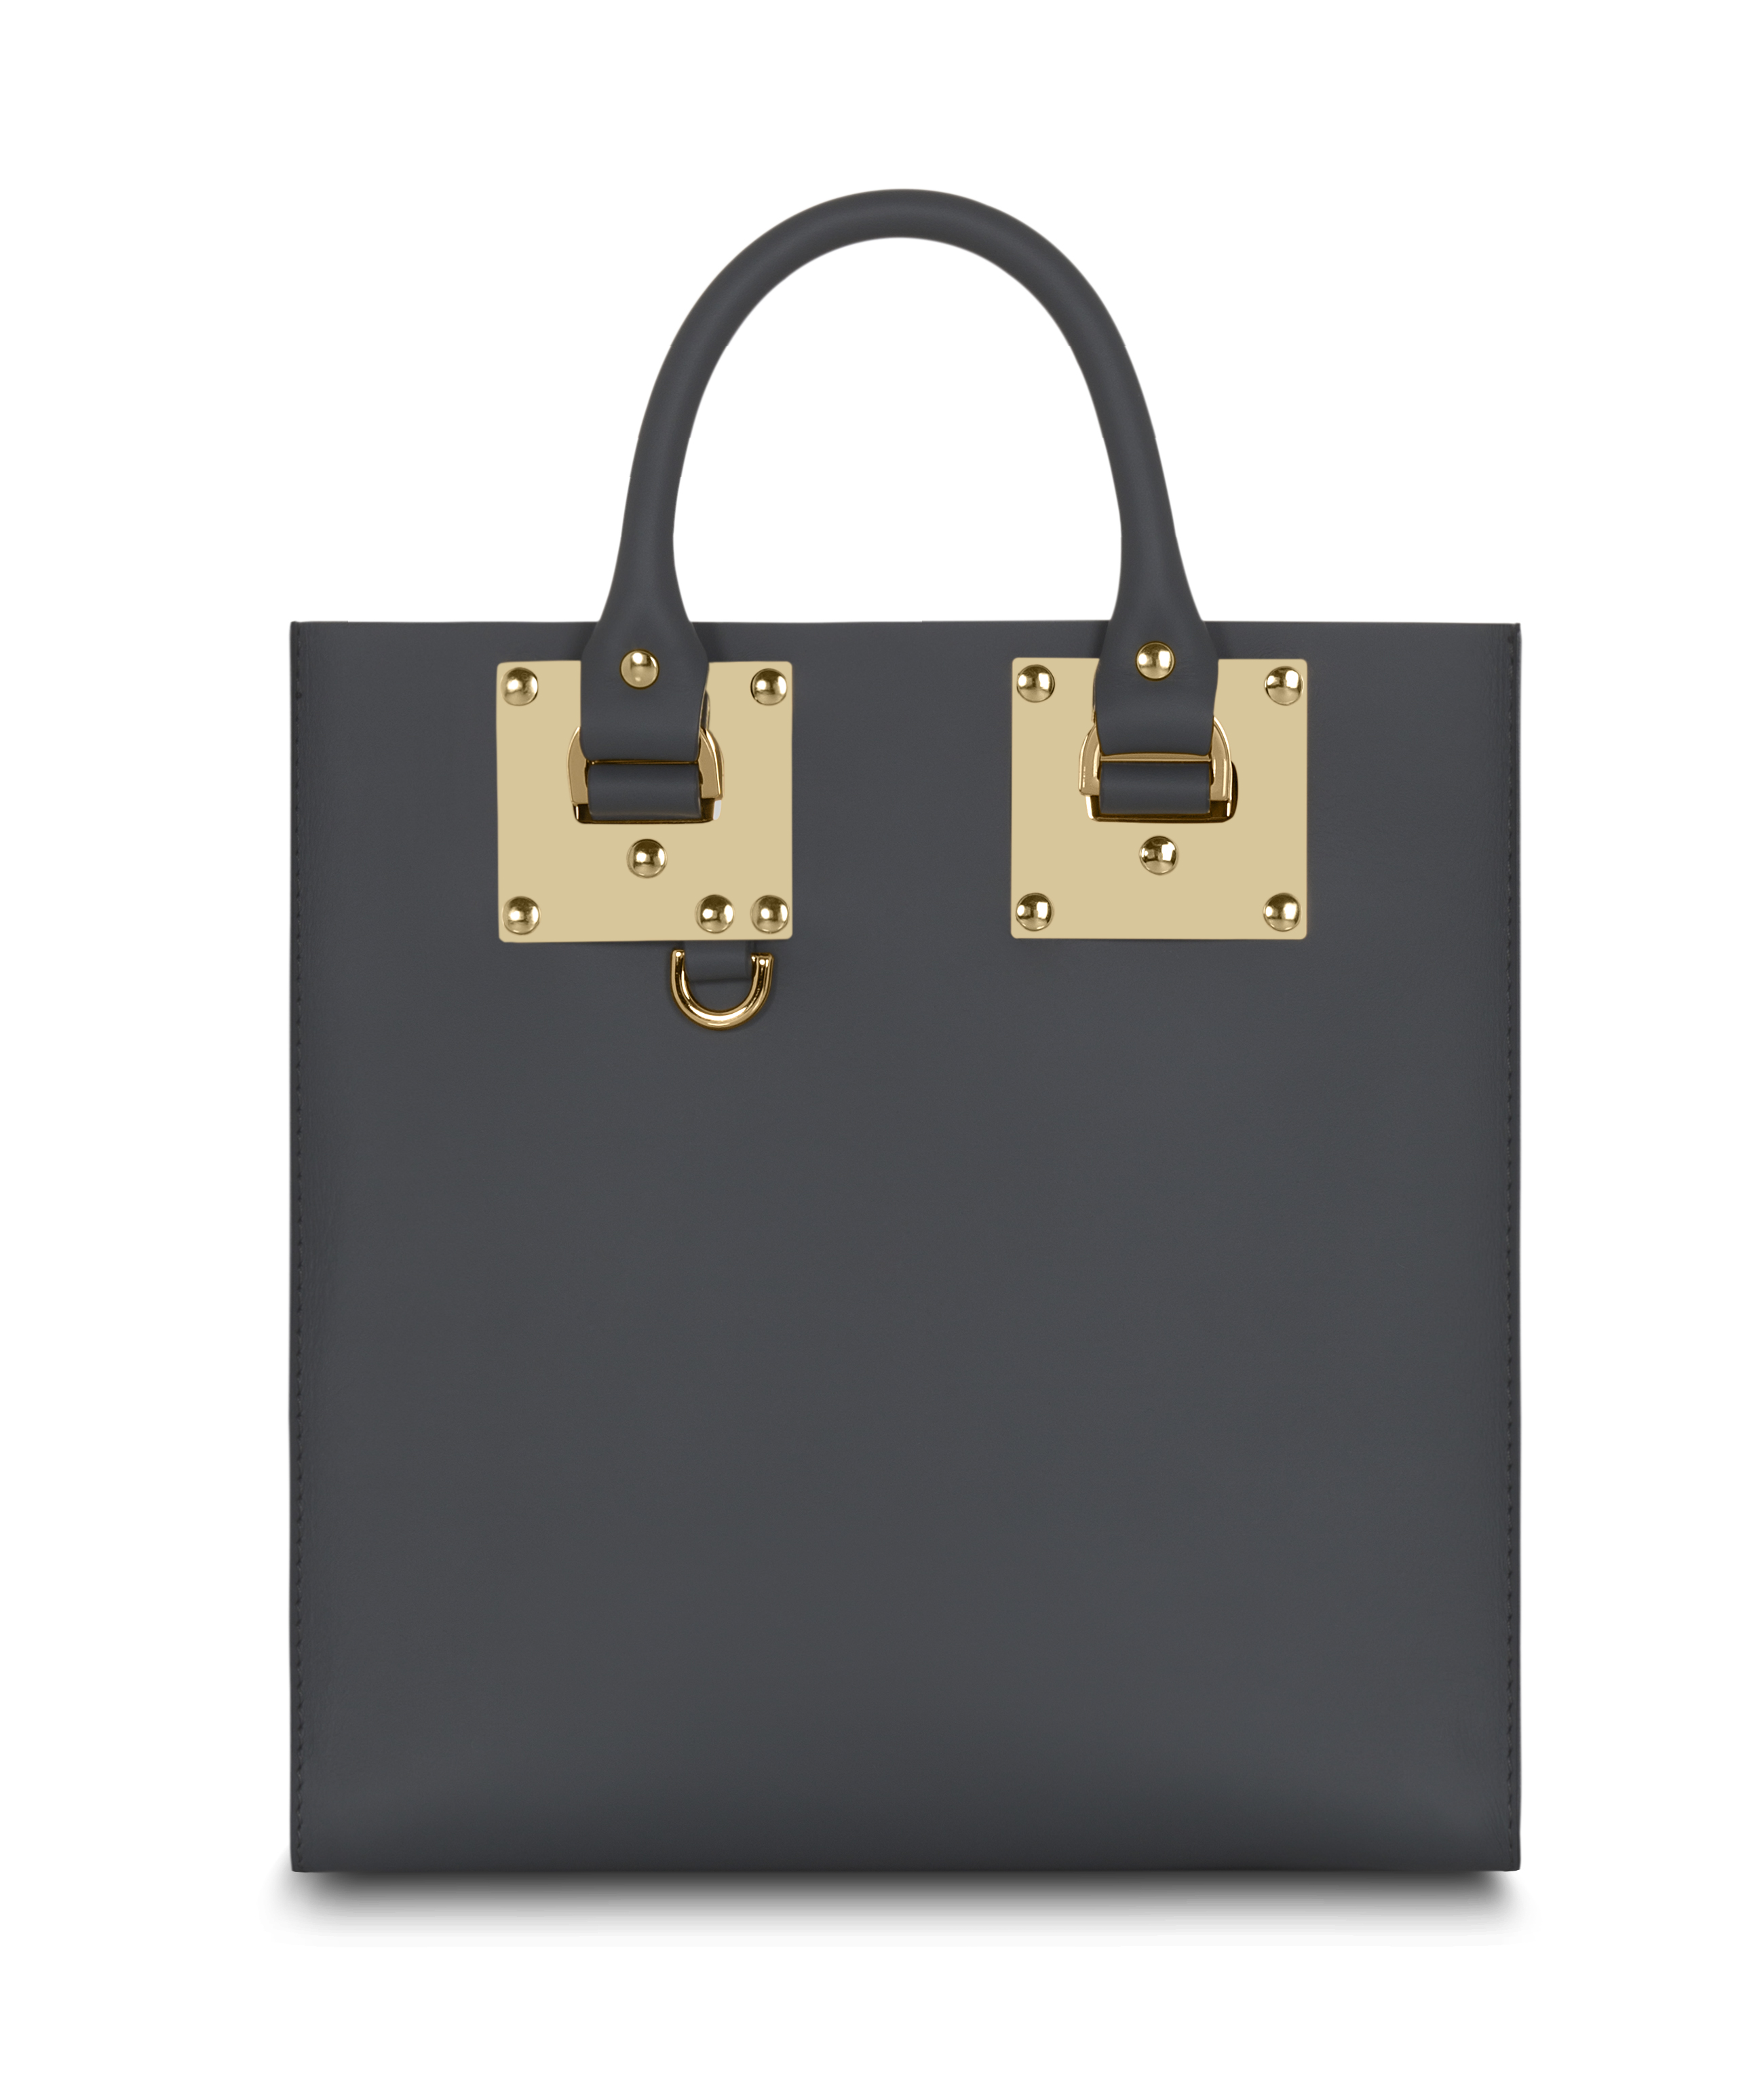 Sophie Hulme's Albion square bag